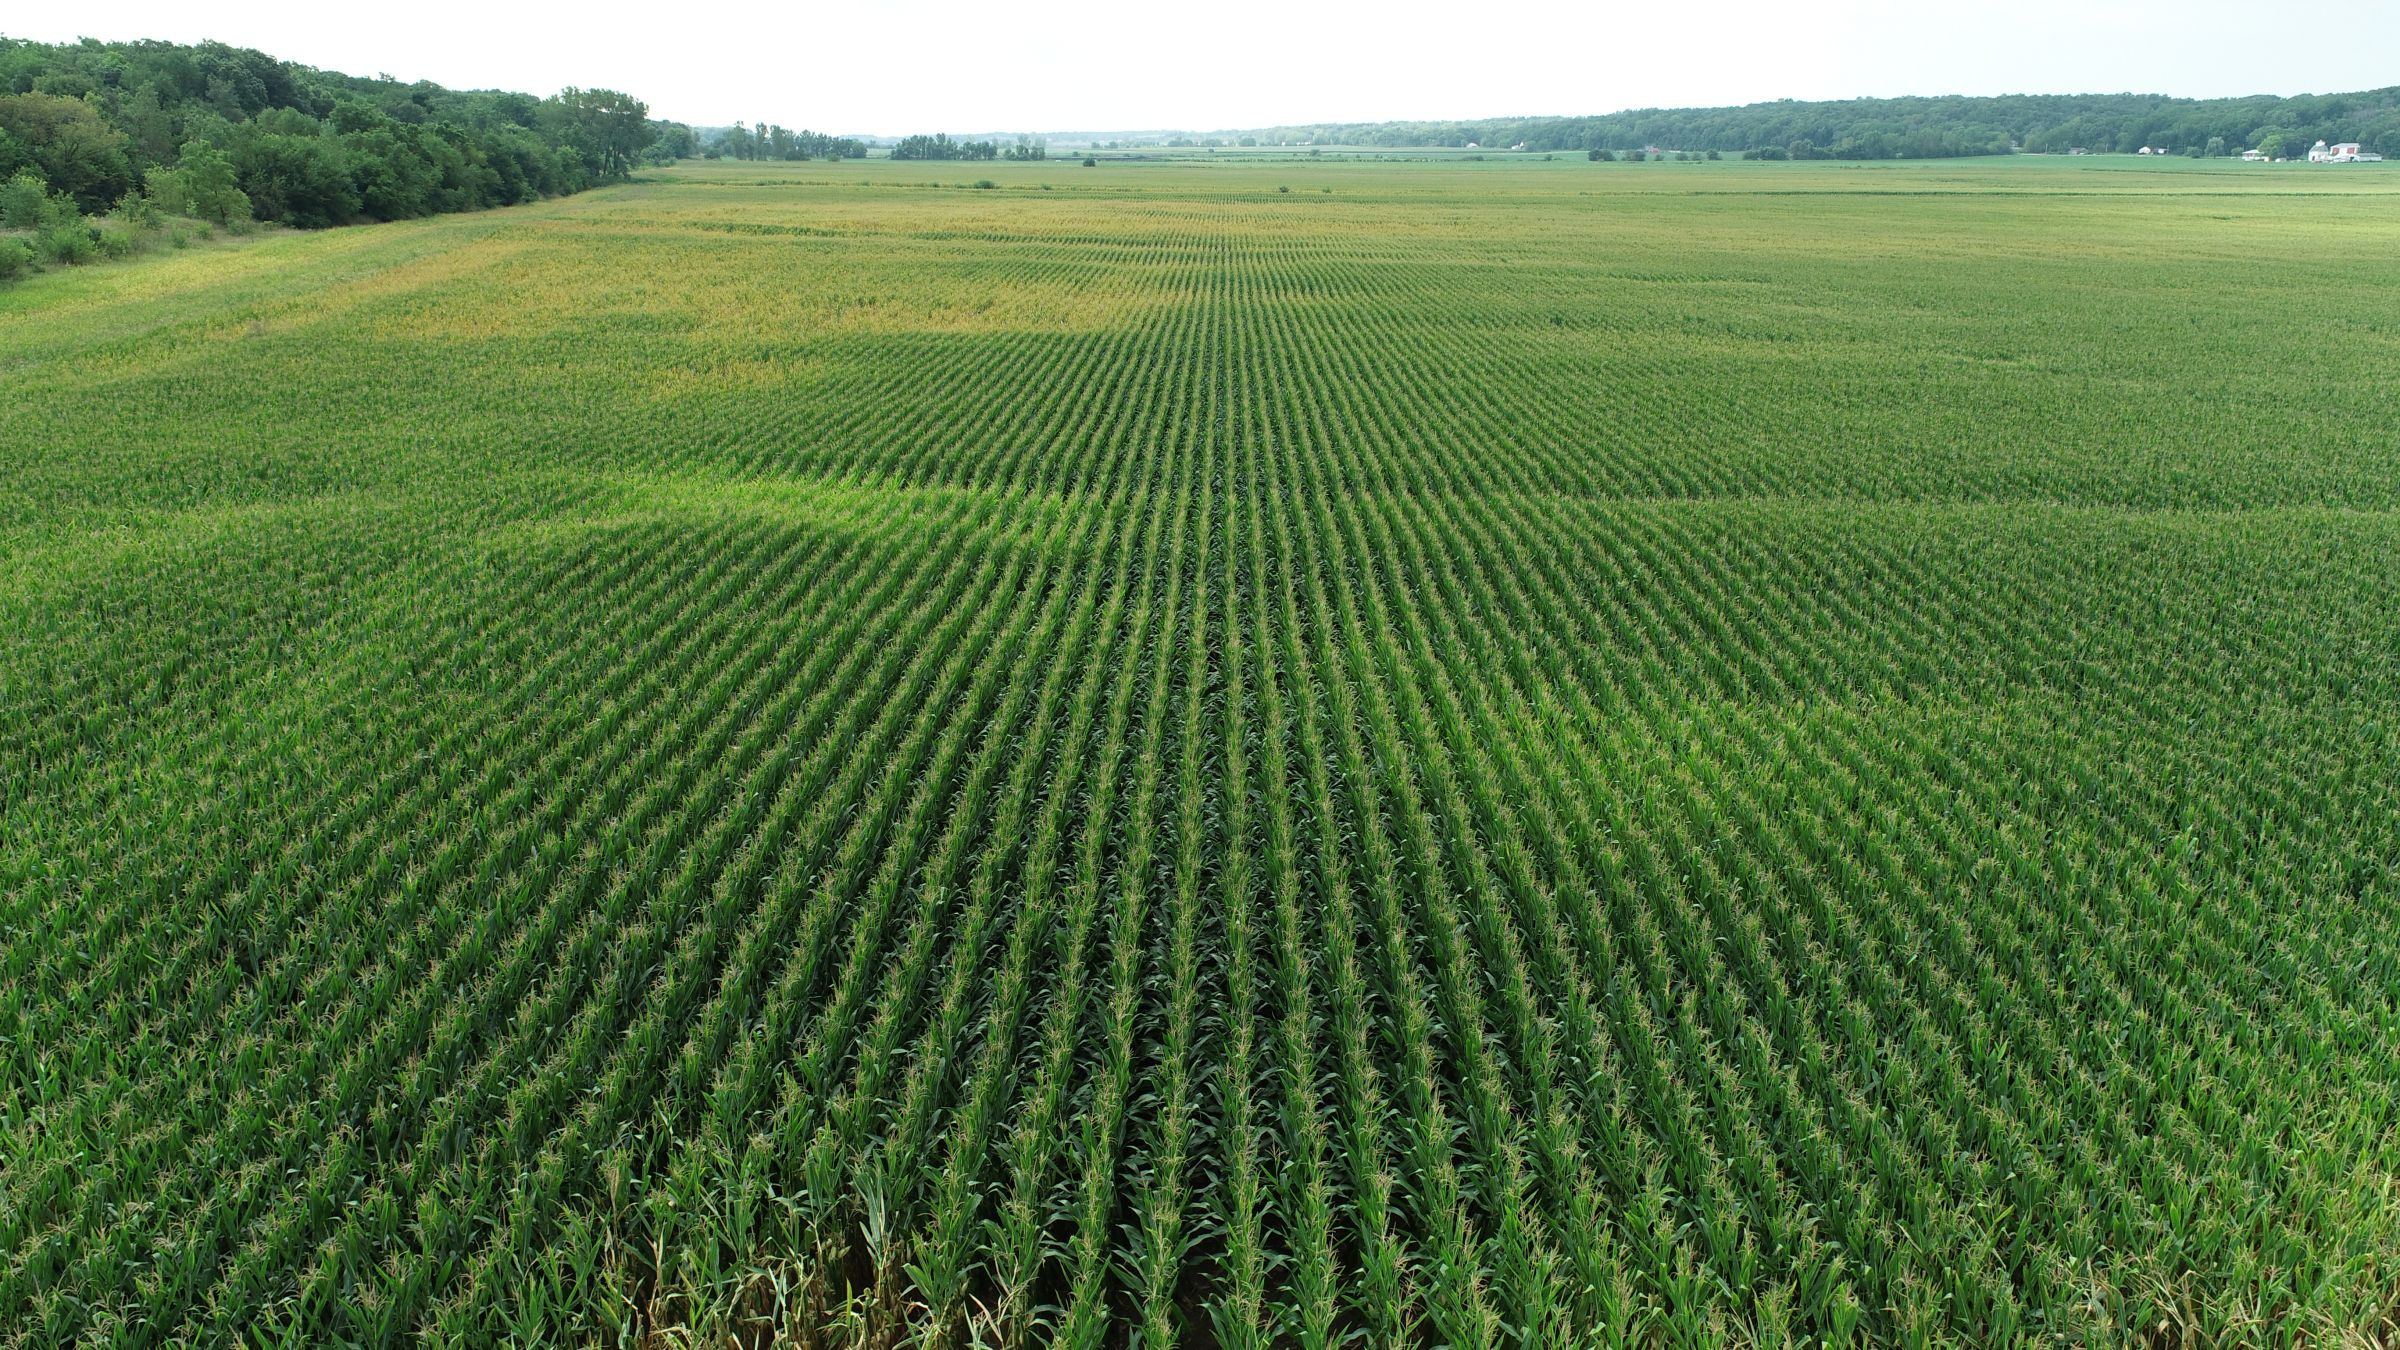 land-whiteside-county-illinois-146-acres-listing-number-15705-0-2021-08-27-180457.JPG